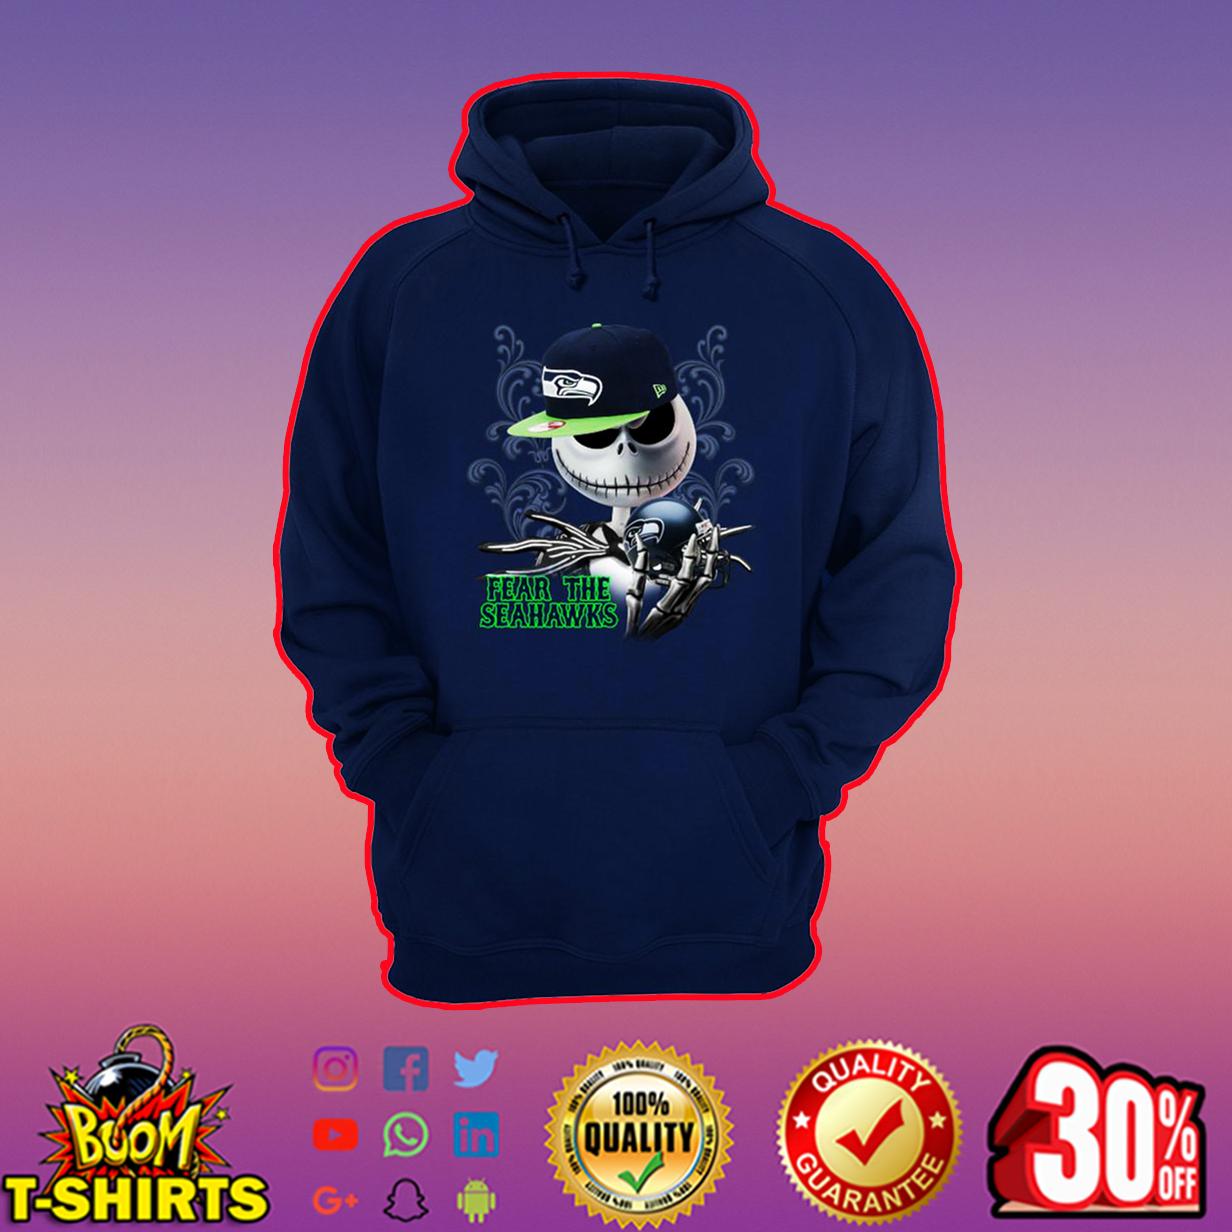 Jack Skellington Fear The Seahawks hoodie